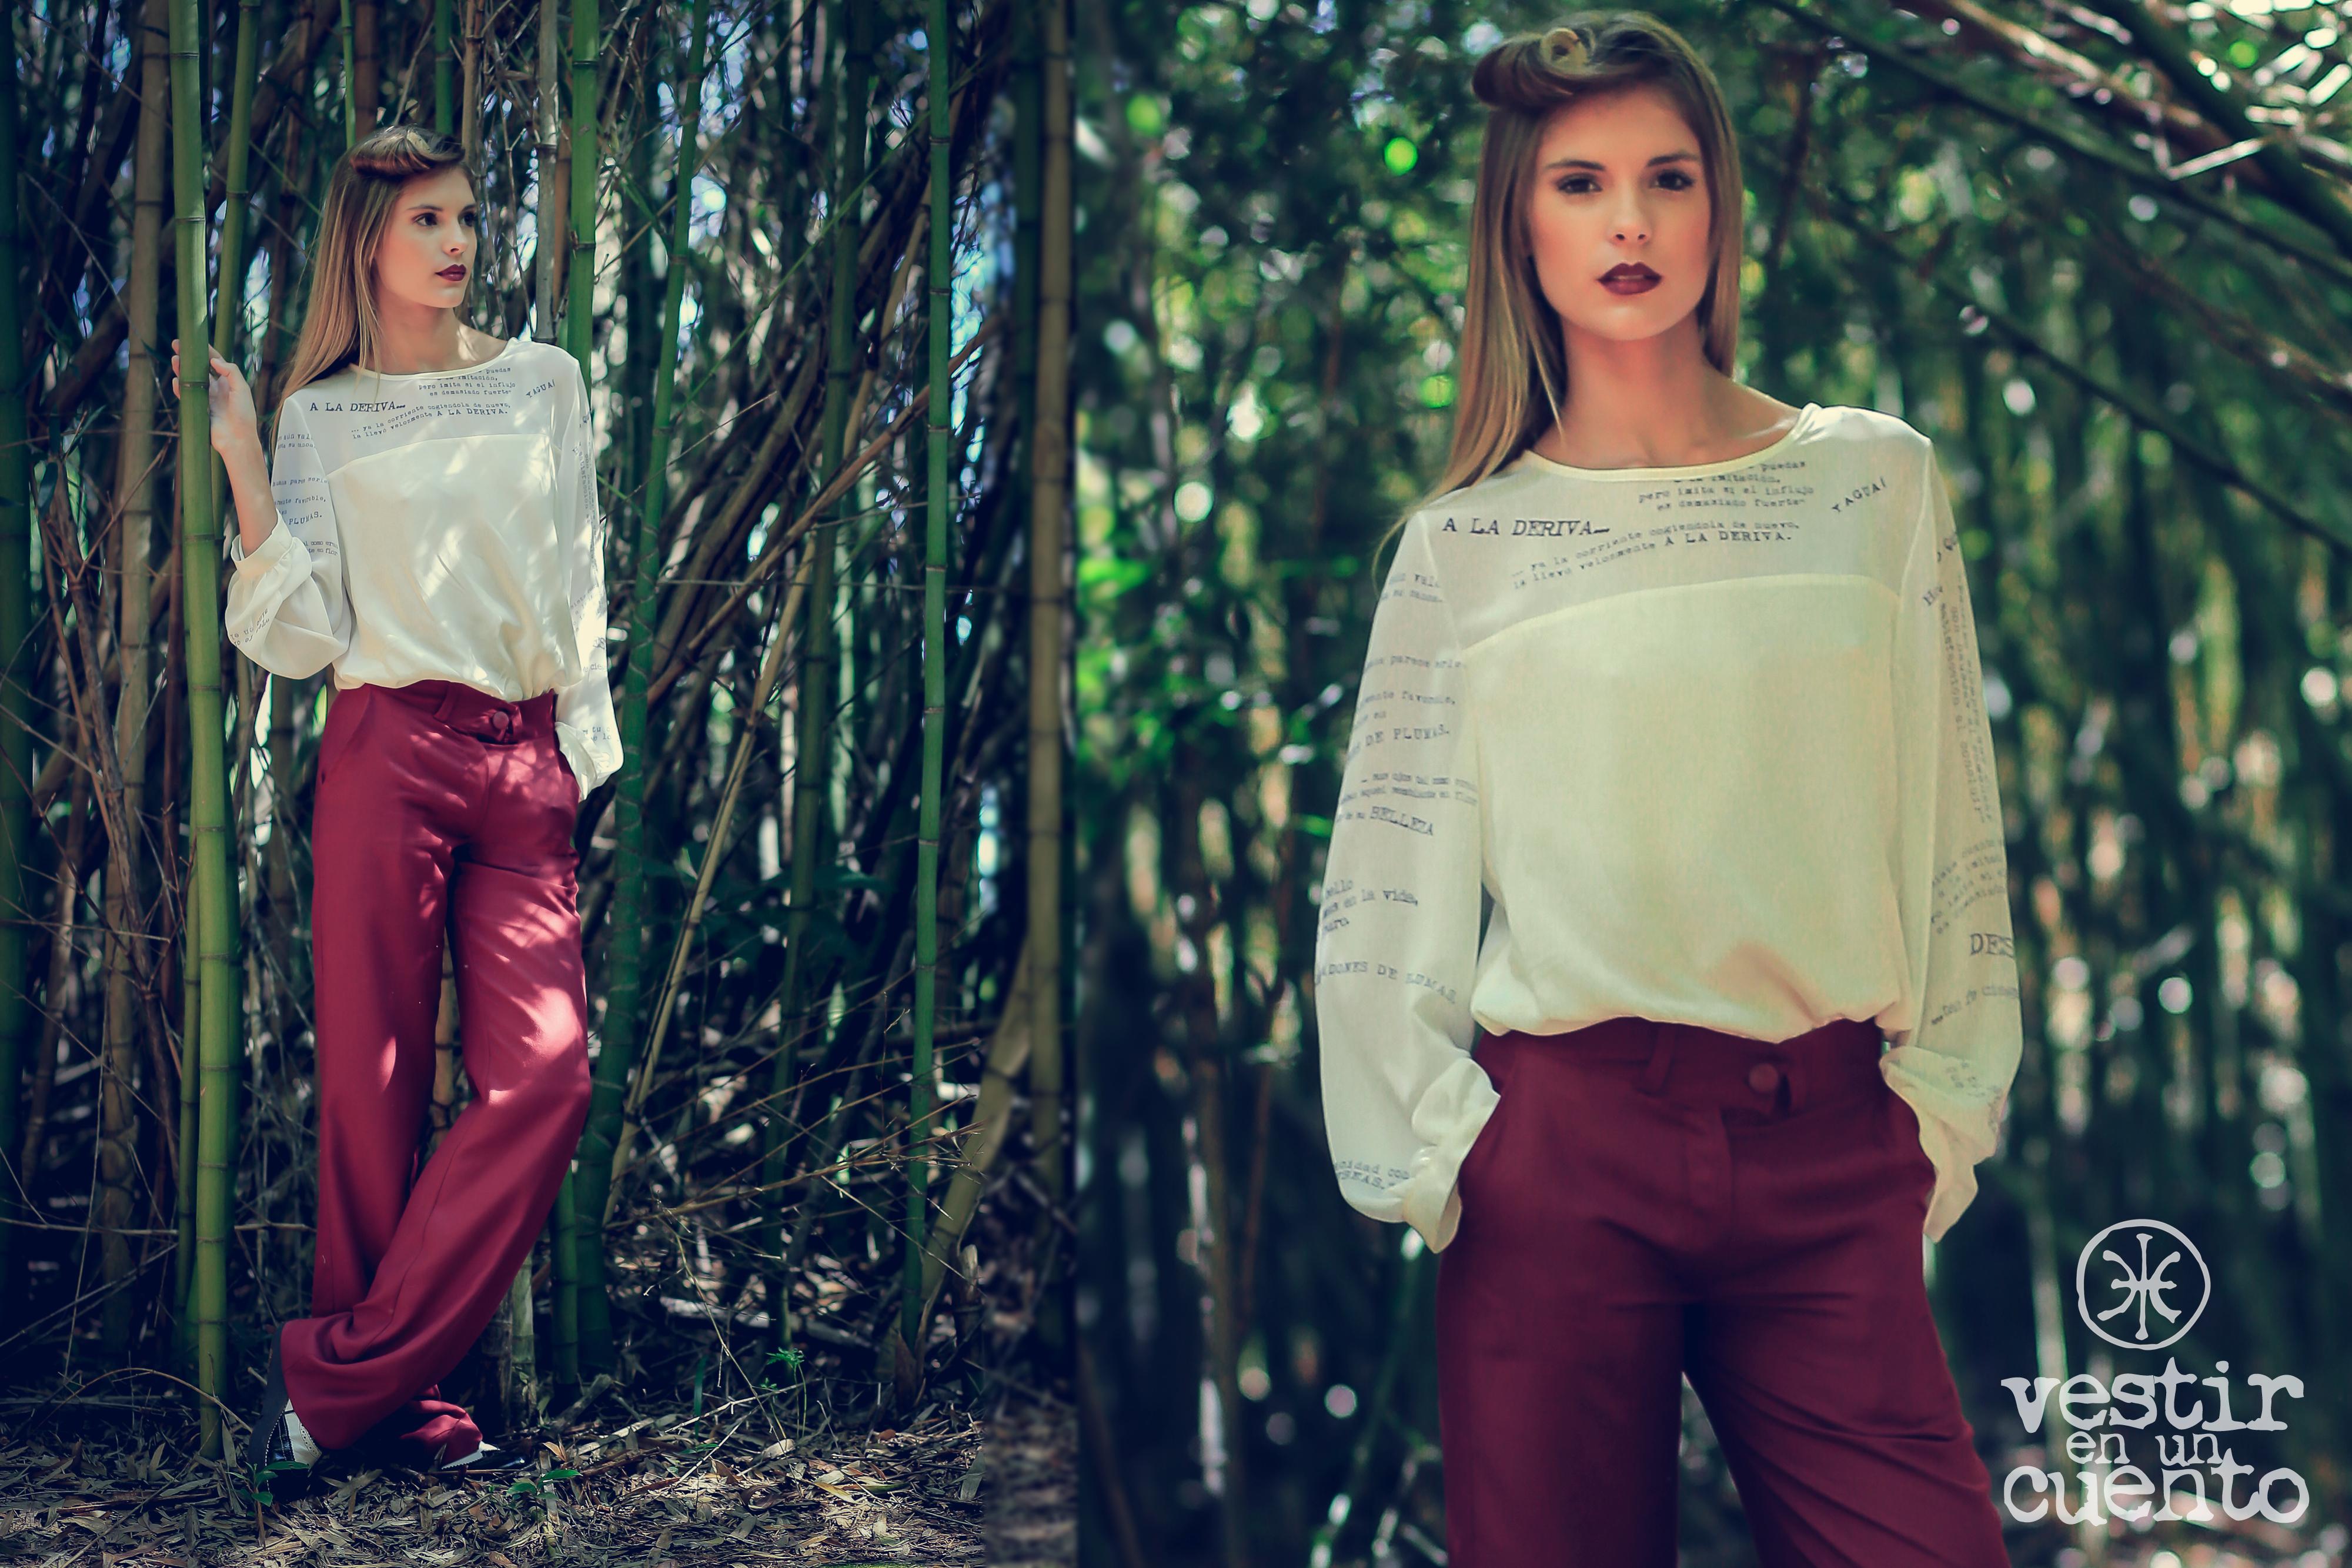 Erica Vega presentará su nueva colección de moda inspirada en Horacio Quiroga